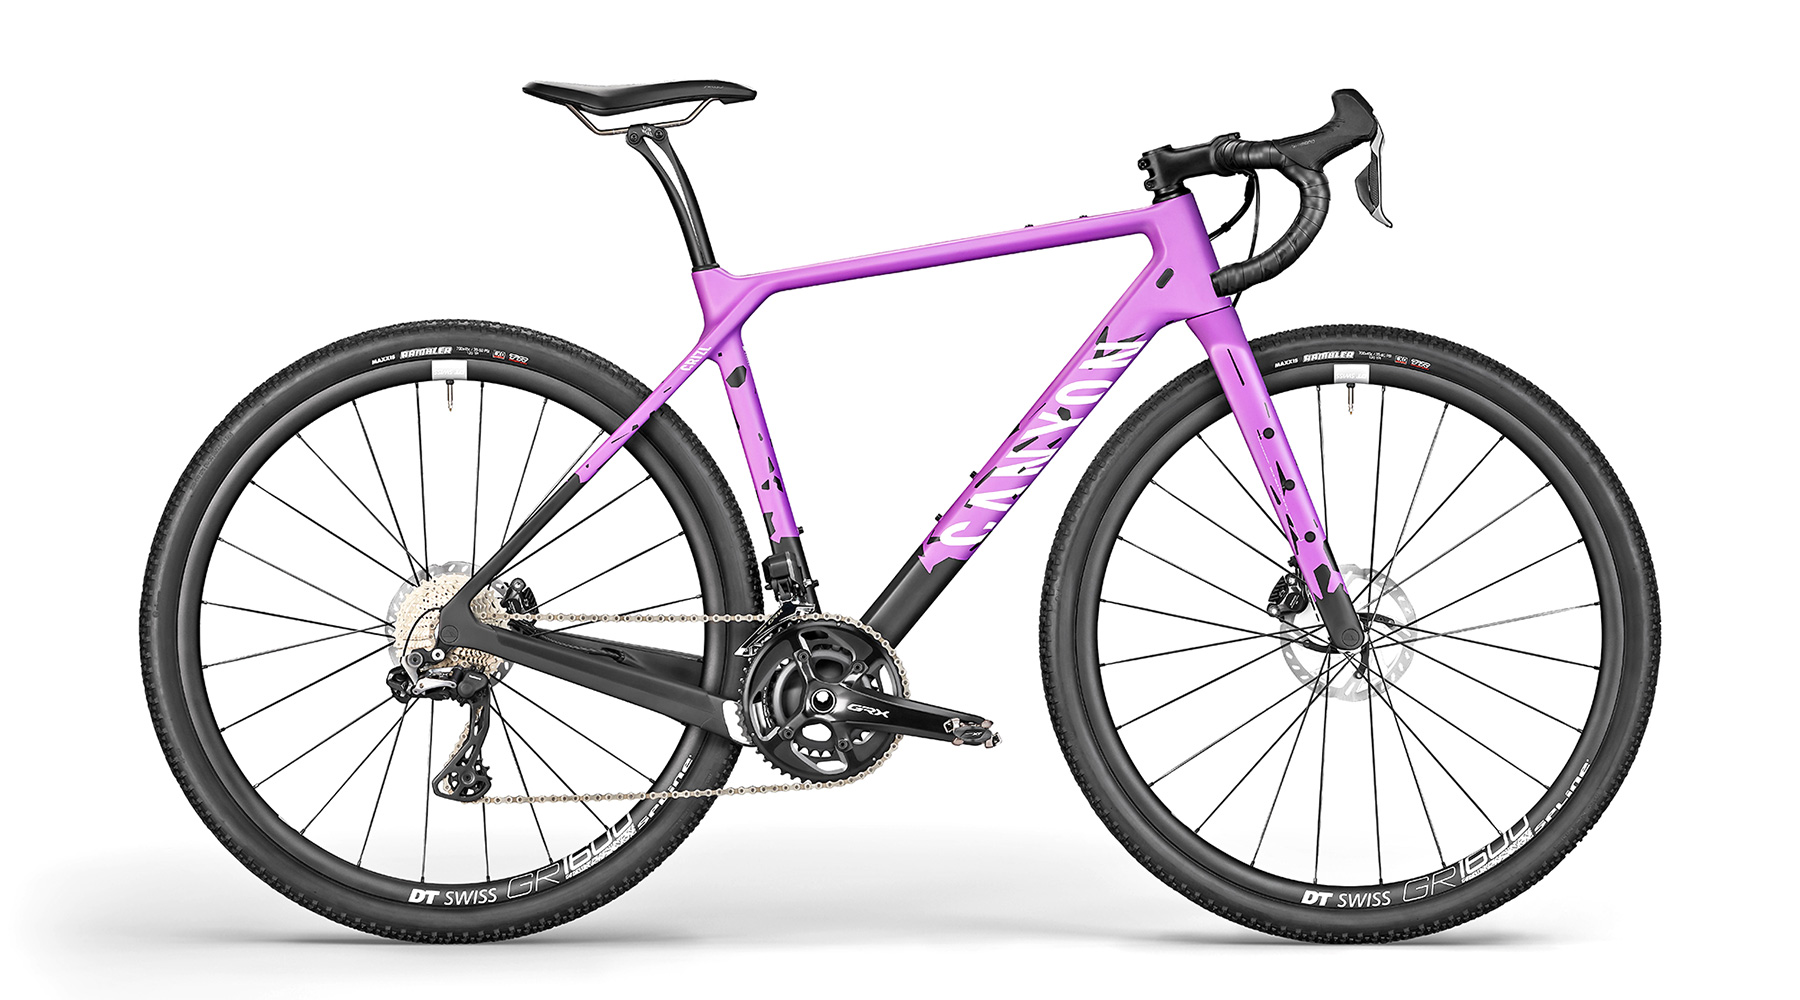 All-new 2021 Canyon Grizl carbon gravel bike bikepacking adventure, CF SLX Di2